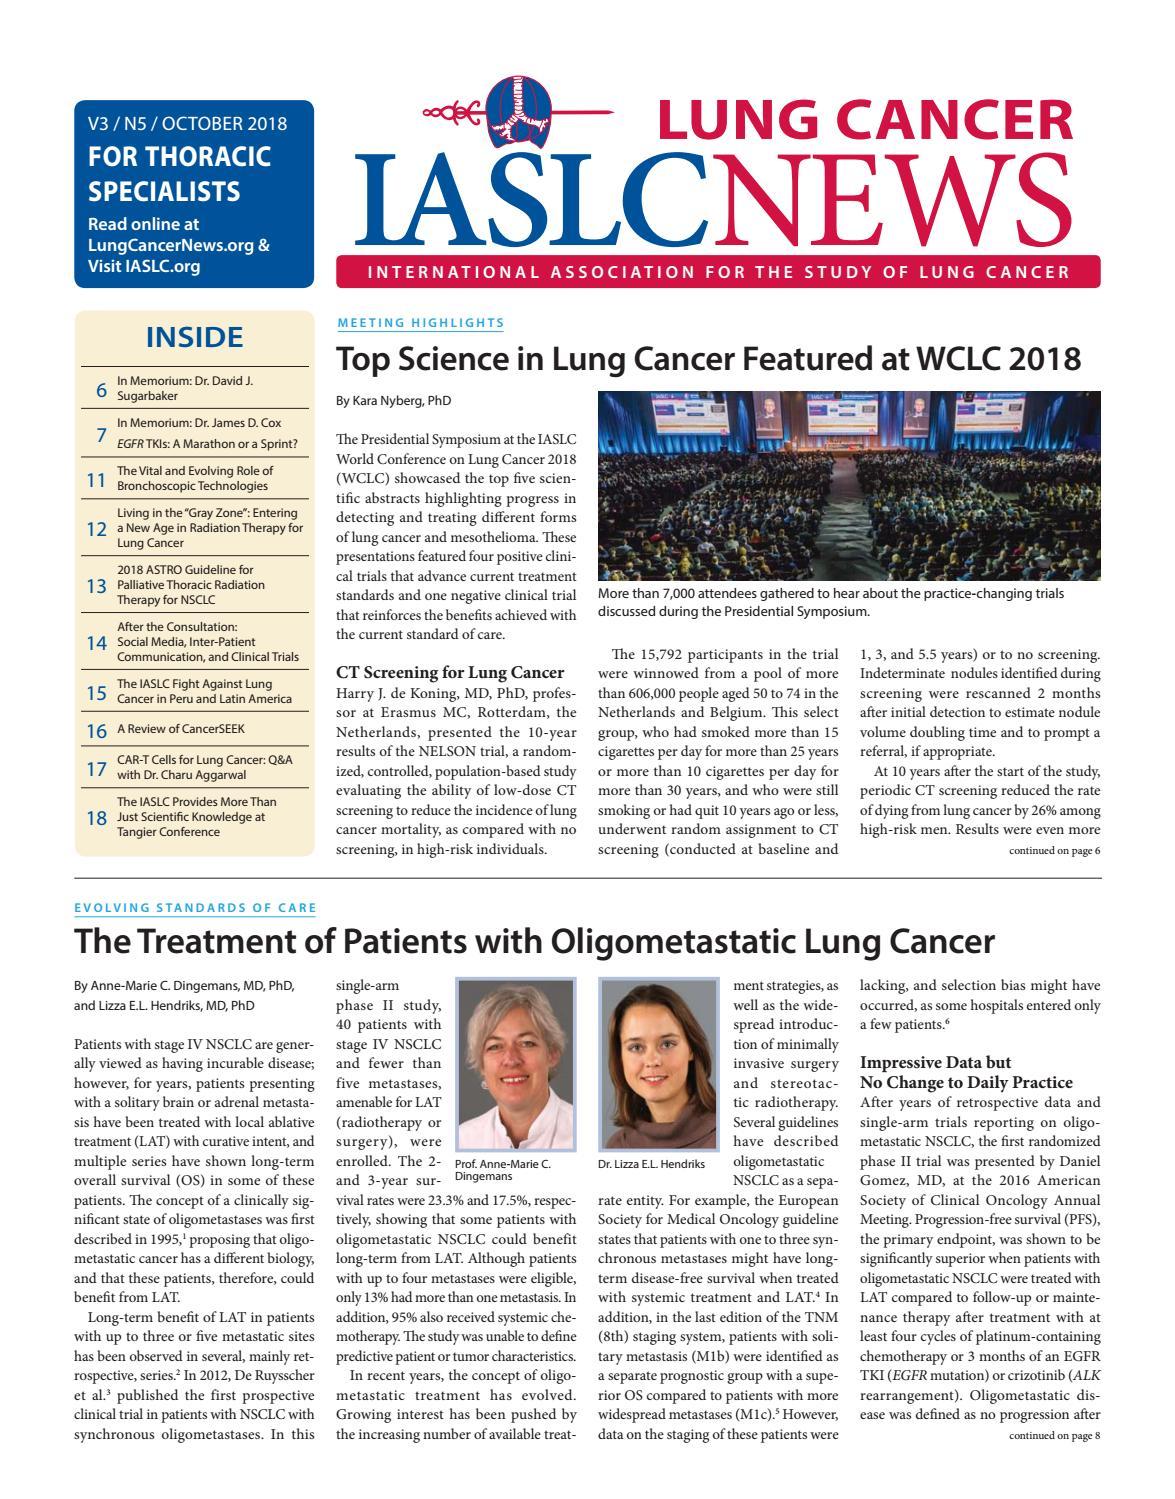 IASLC Lung Cancer News - October 2018 by IASLC - issuu